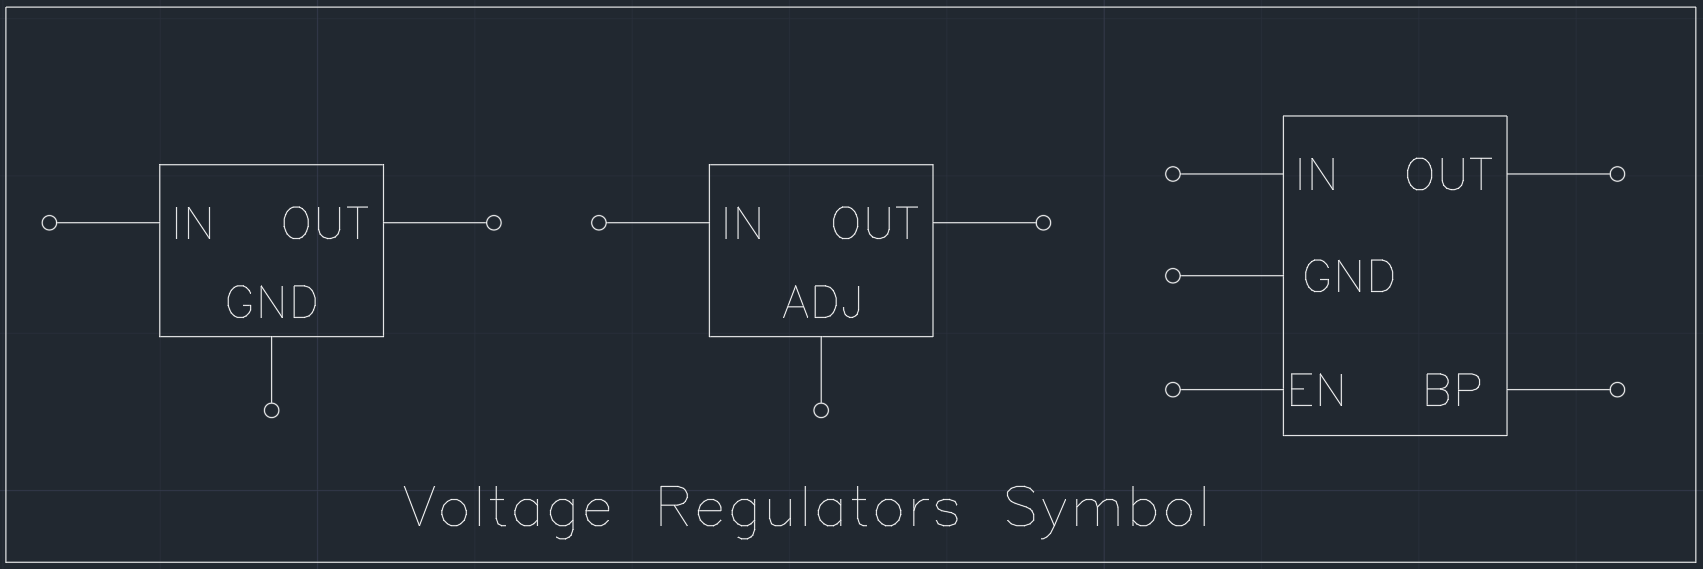 Voltage Regulators Symbol | | CAD Block And Typical Drawing